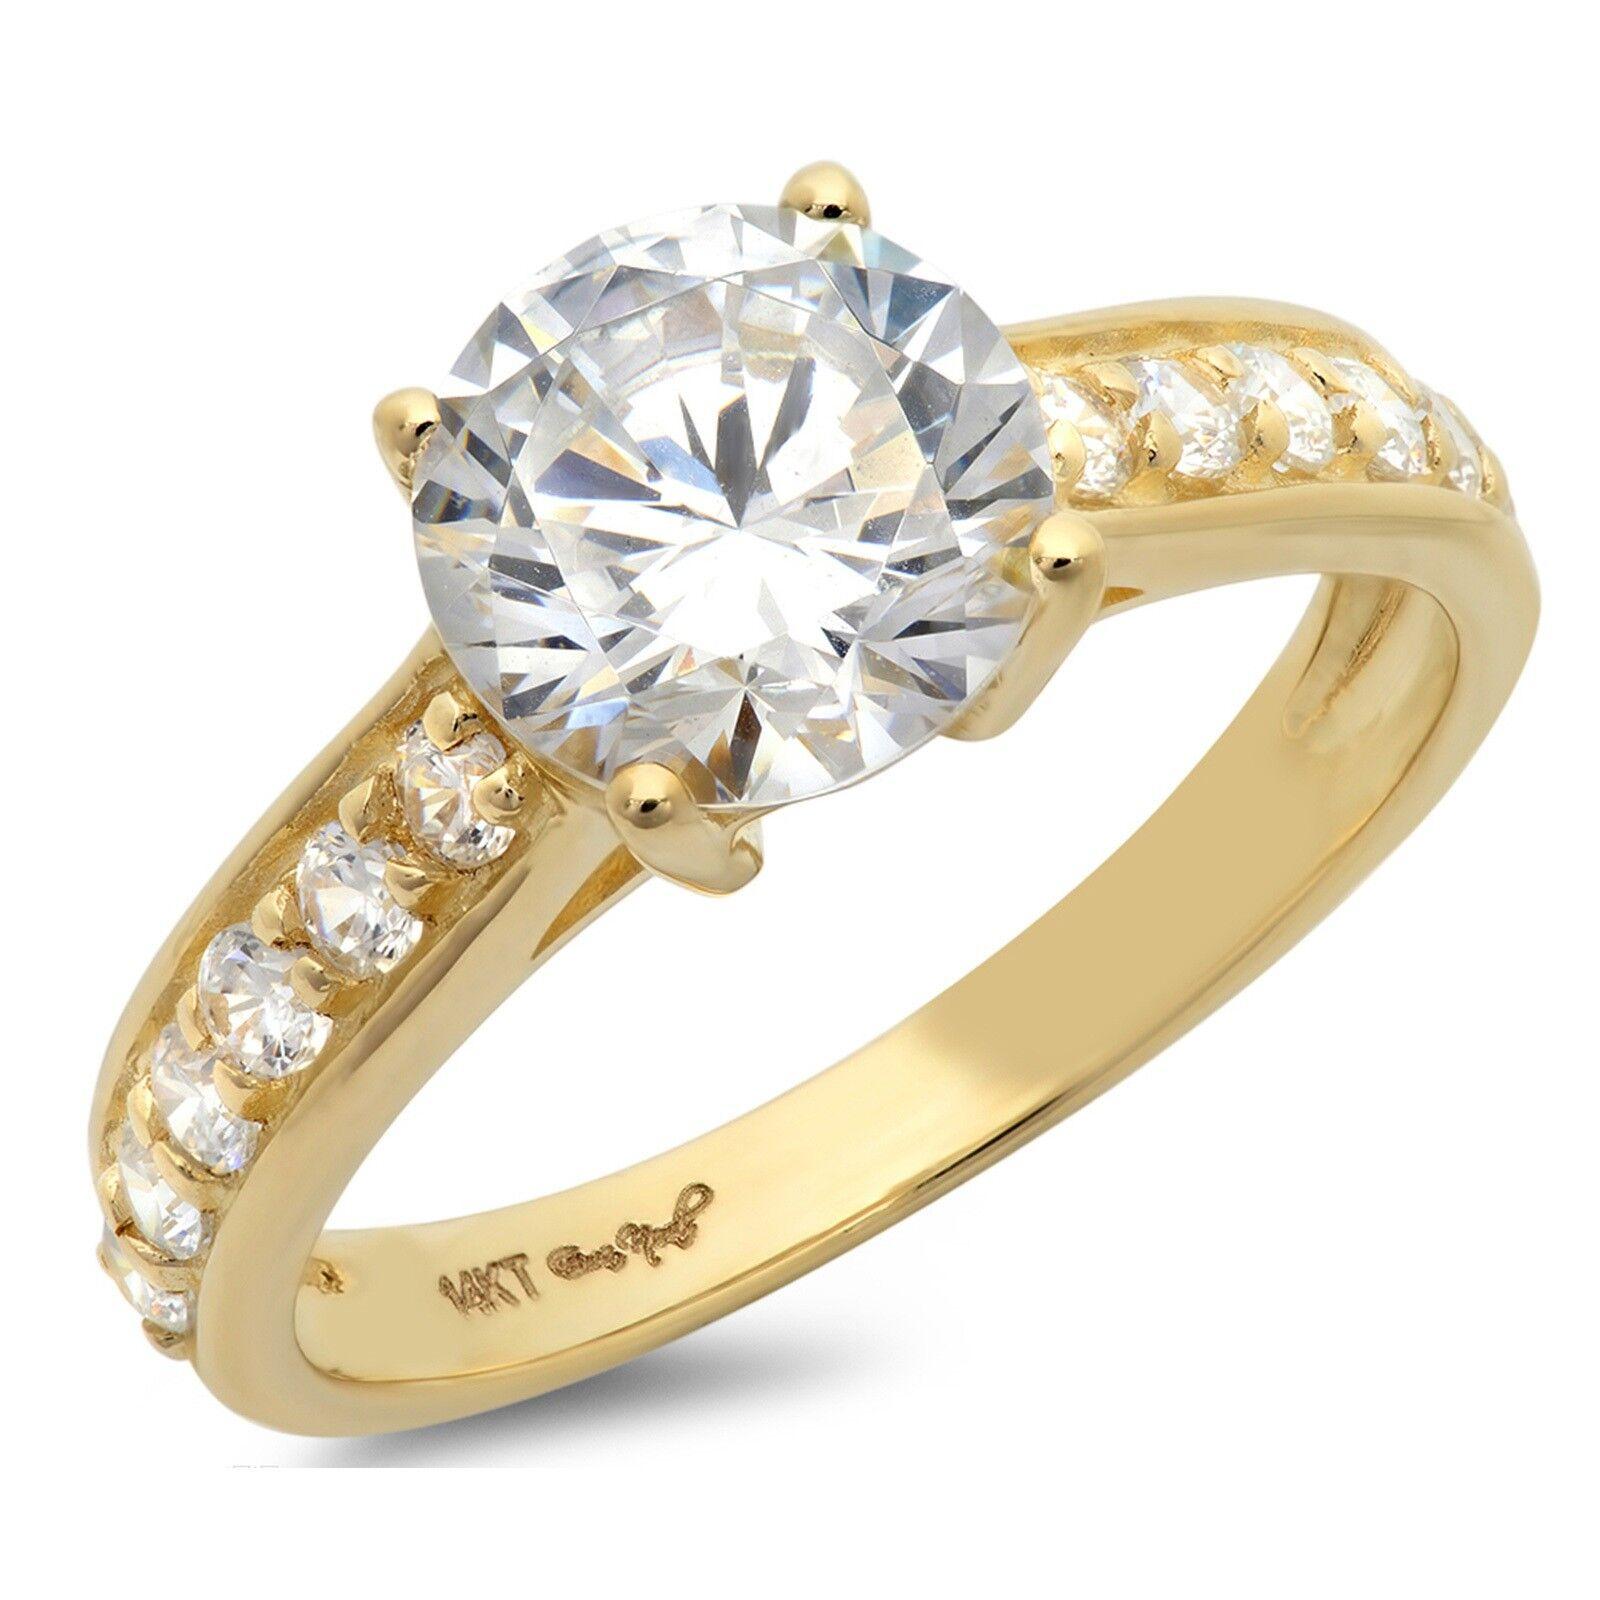 2.15ct Round Cut Wedding Bridal Engagement Anniversary Ring 14k Yellow gold